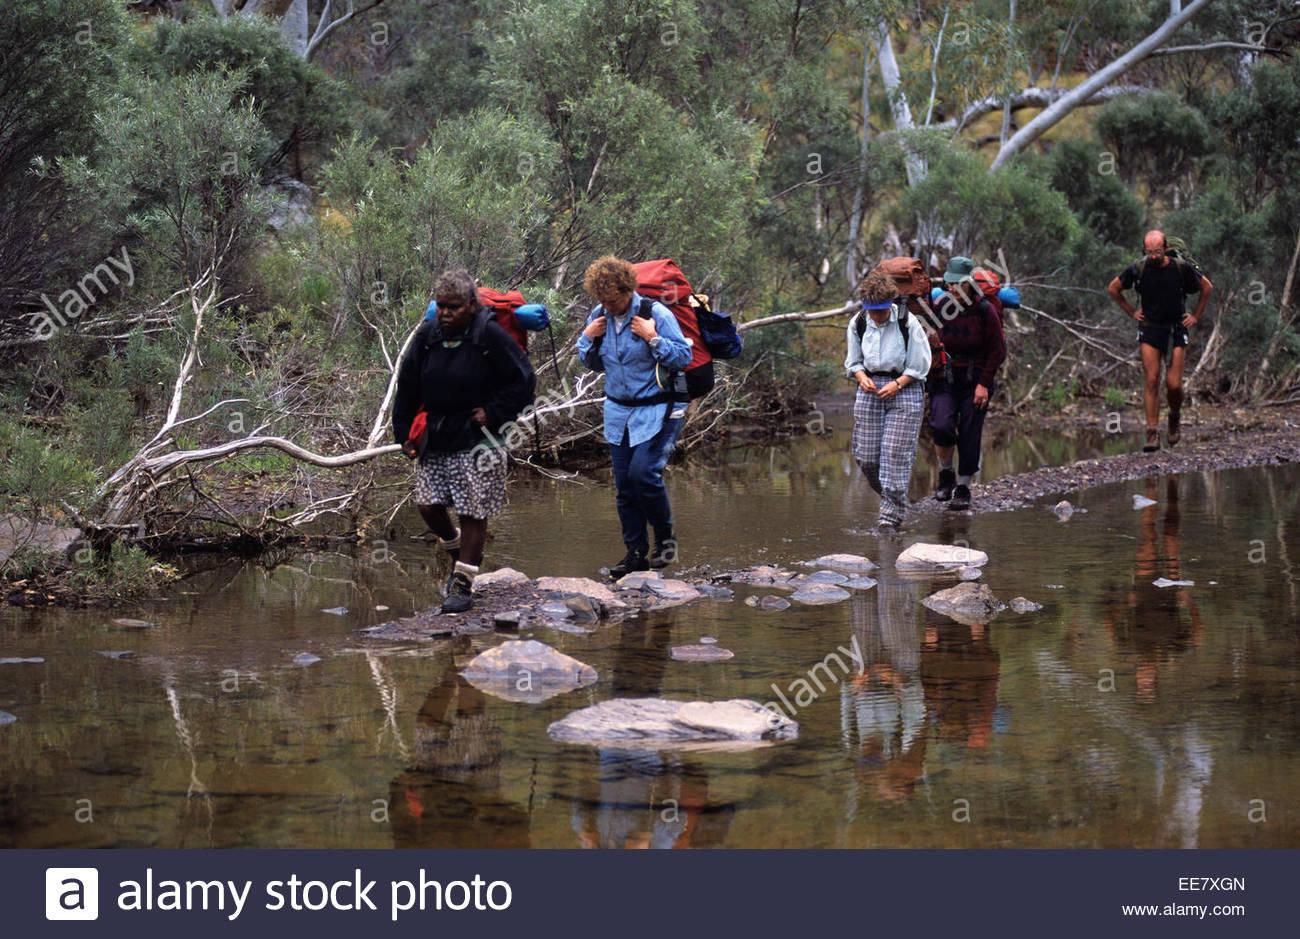 Trekkers walking along a river  in Karijini National Park, Australia. - Stock Image